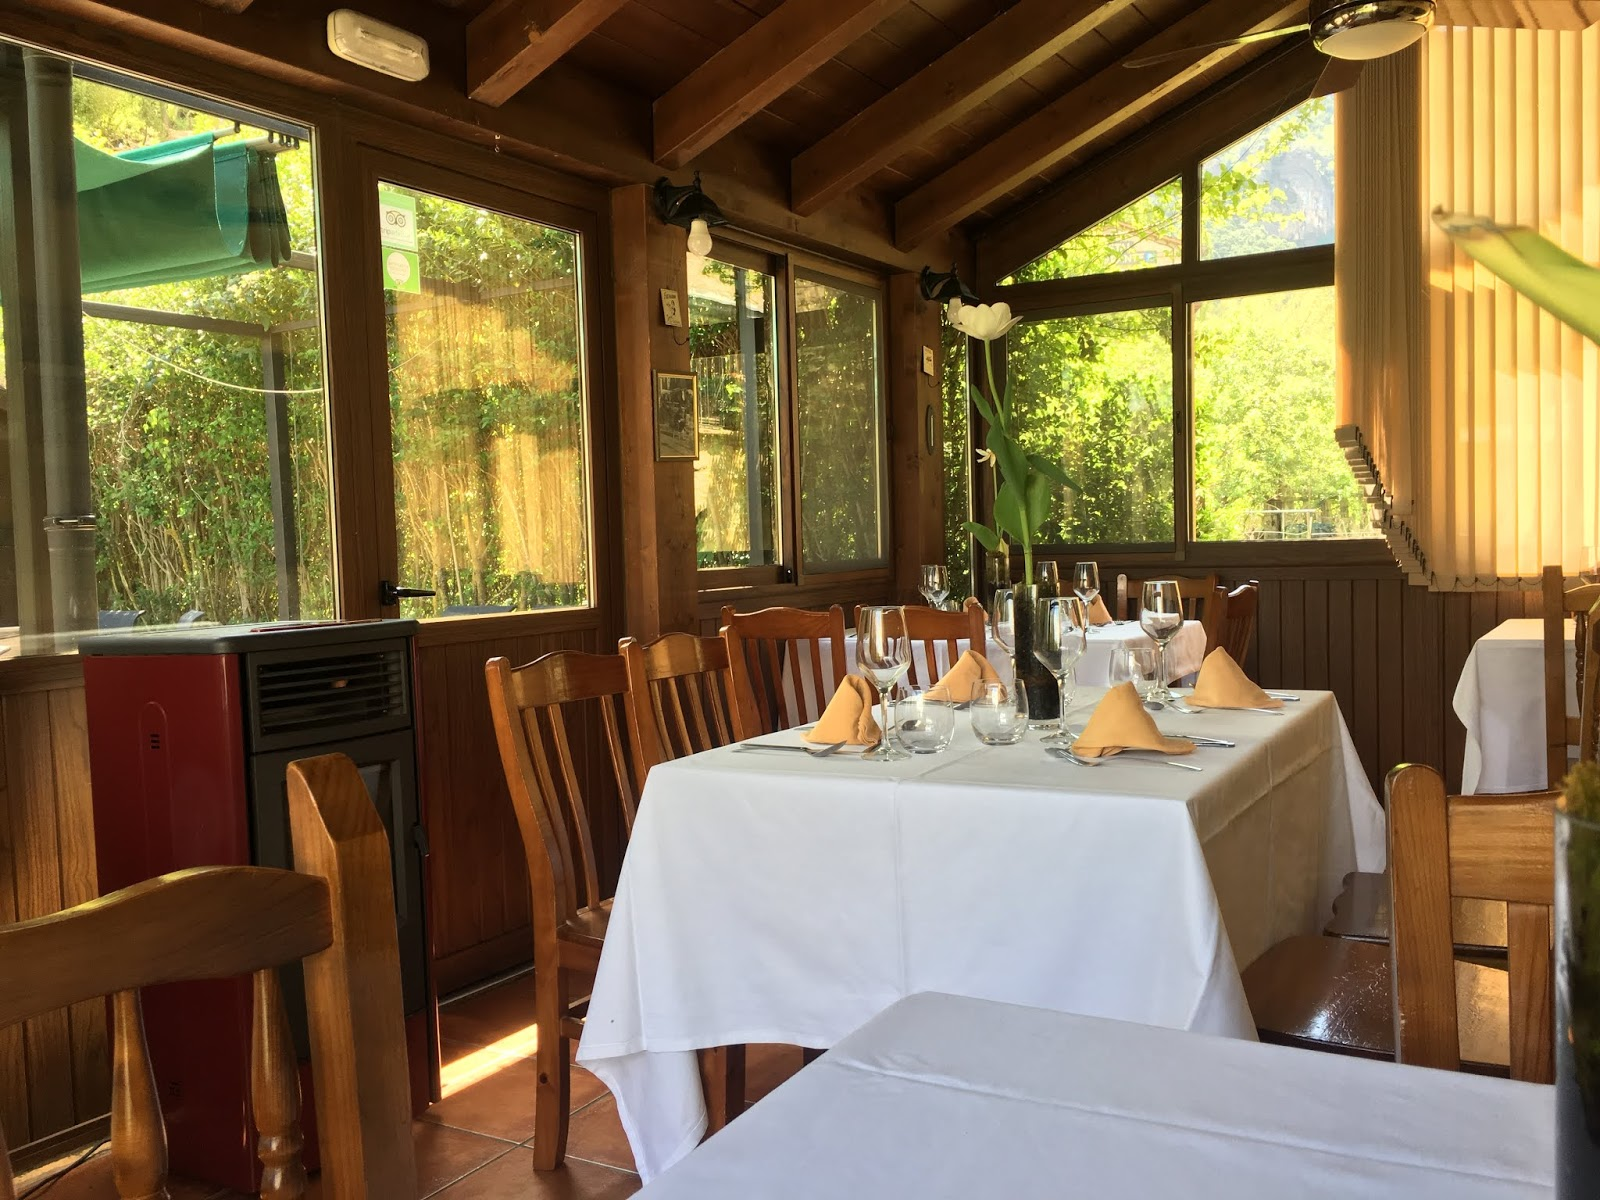 Restaurante O' Fogaril